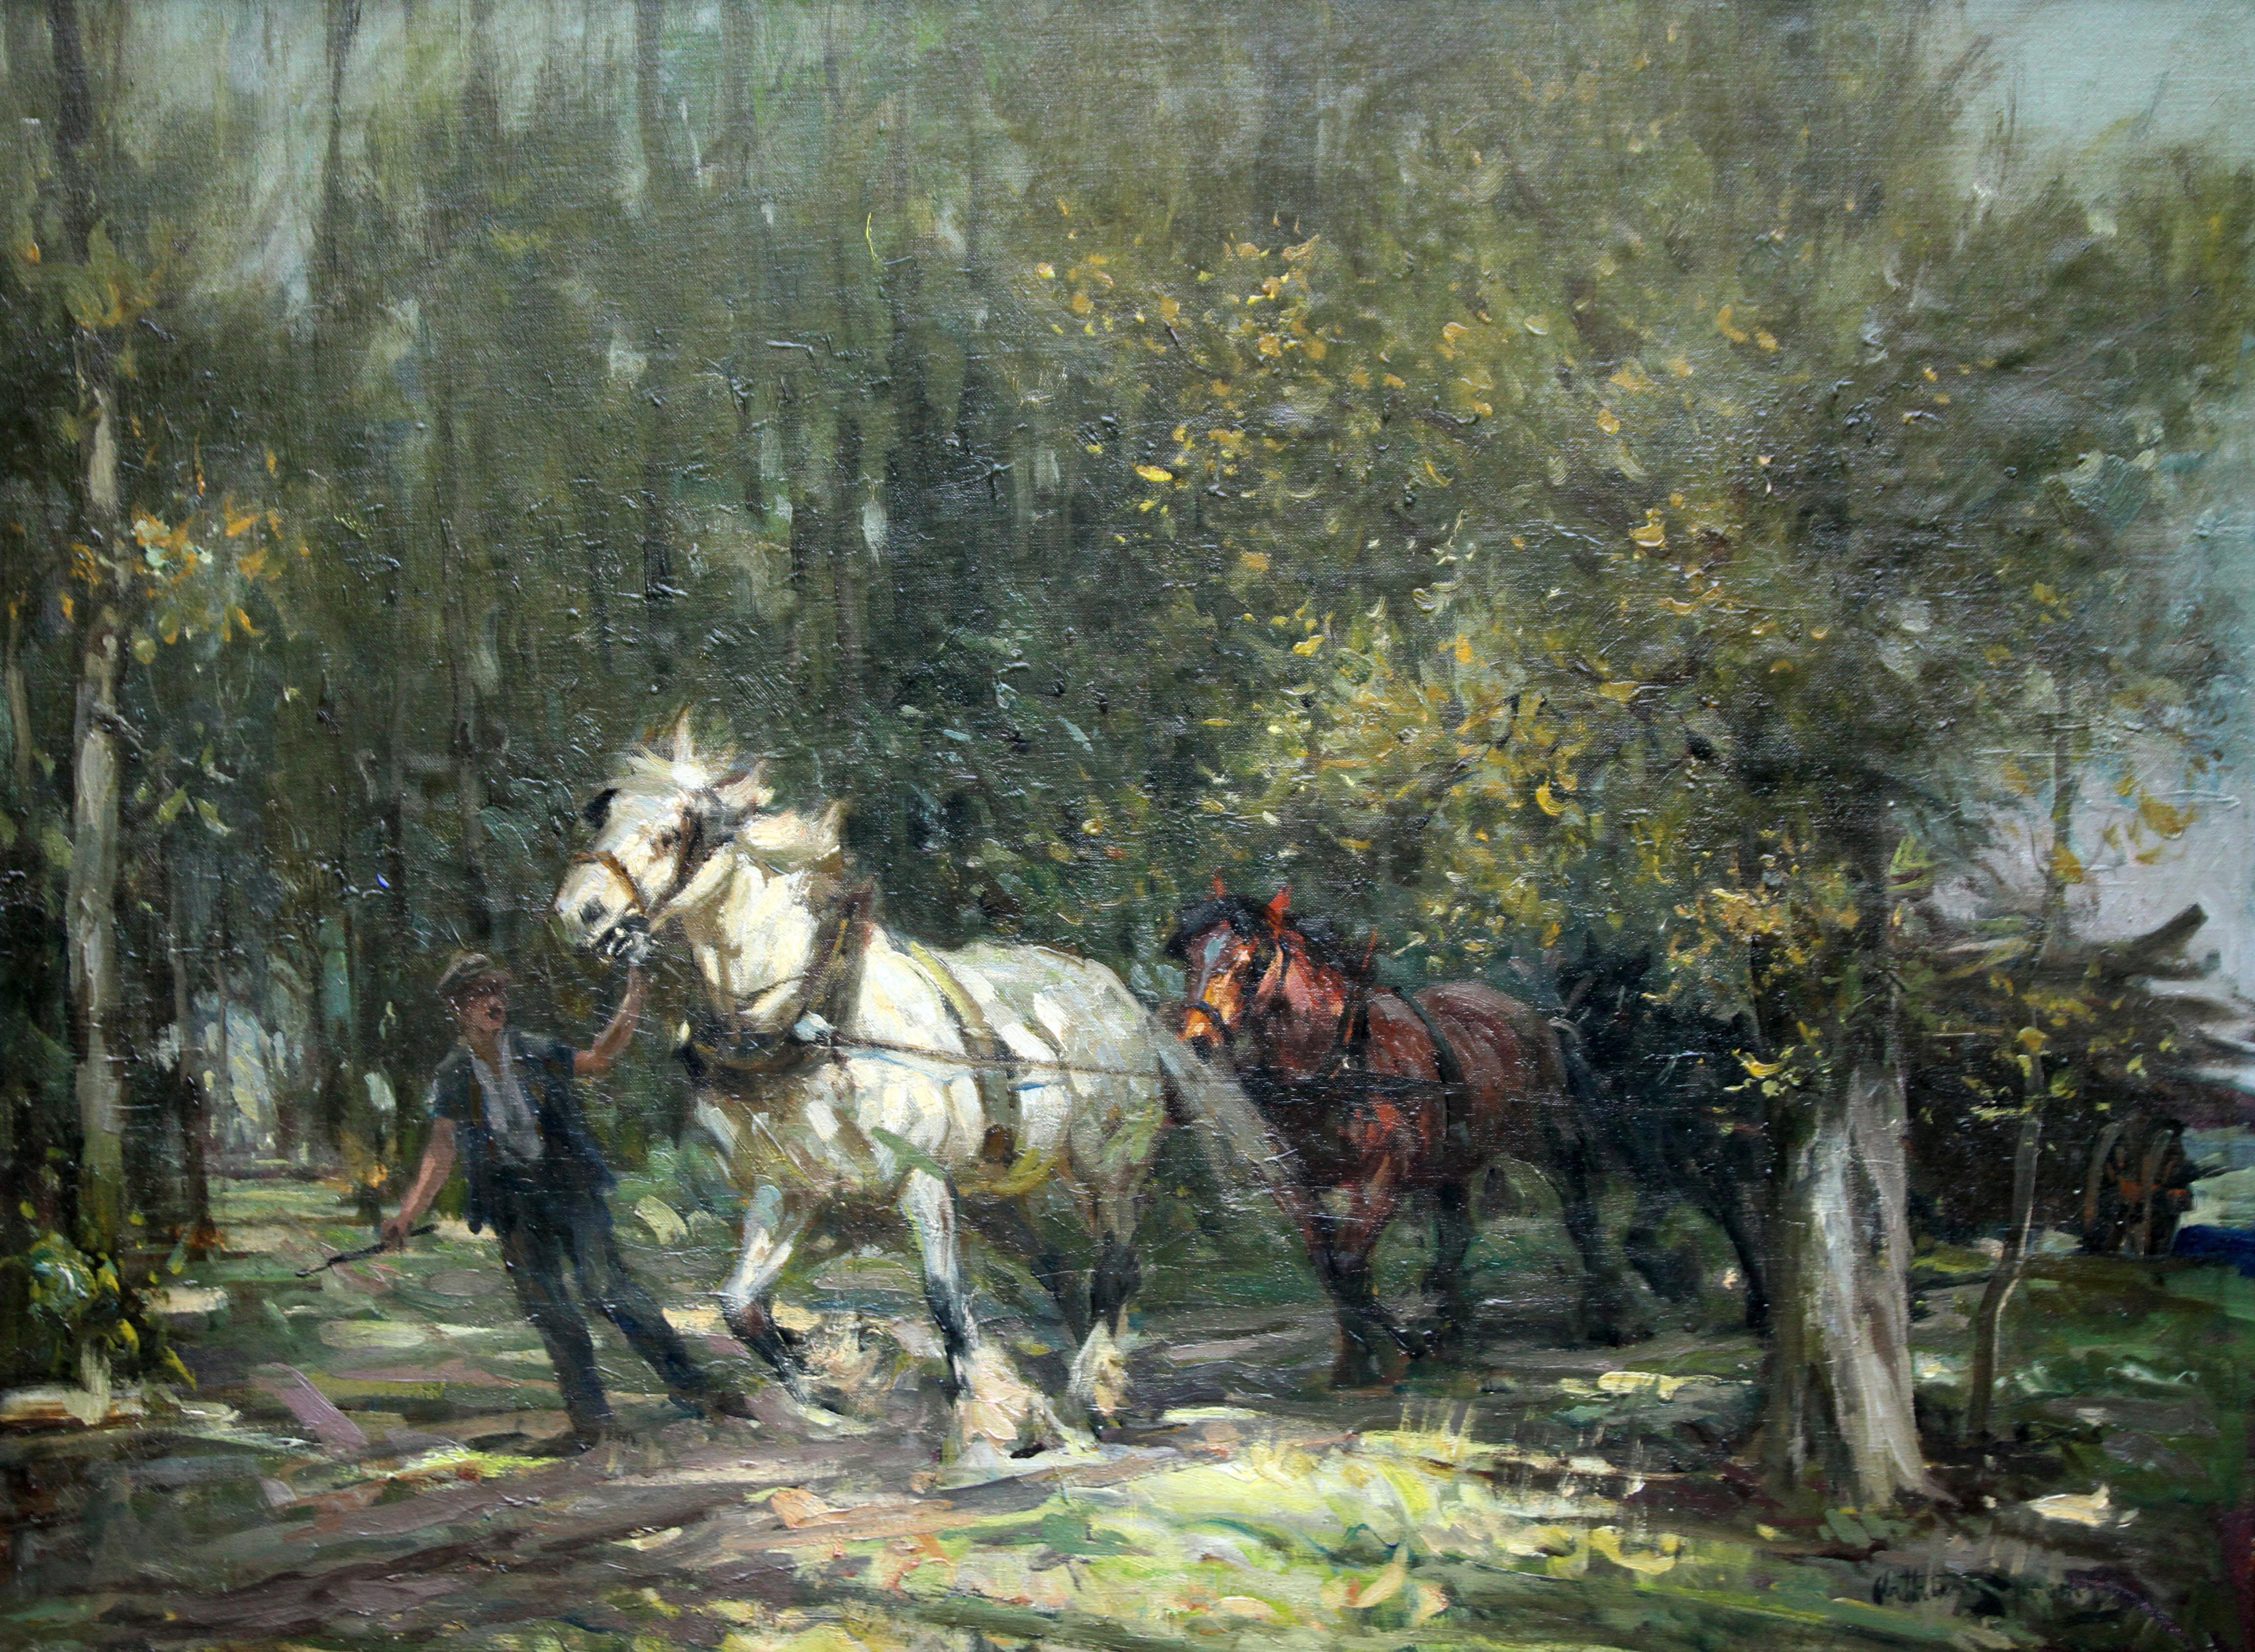 Arthur Spooner